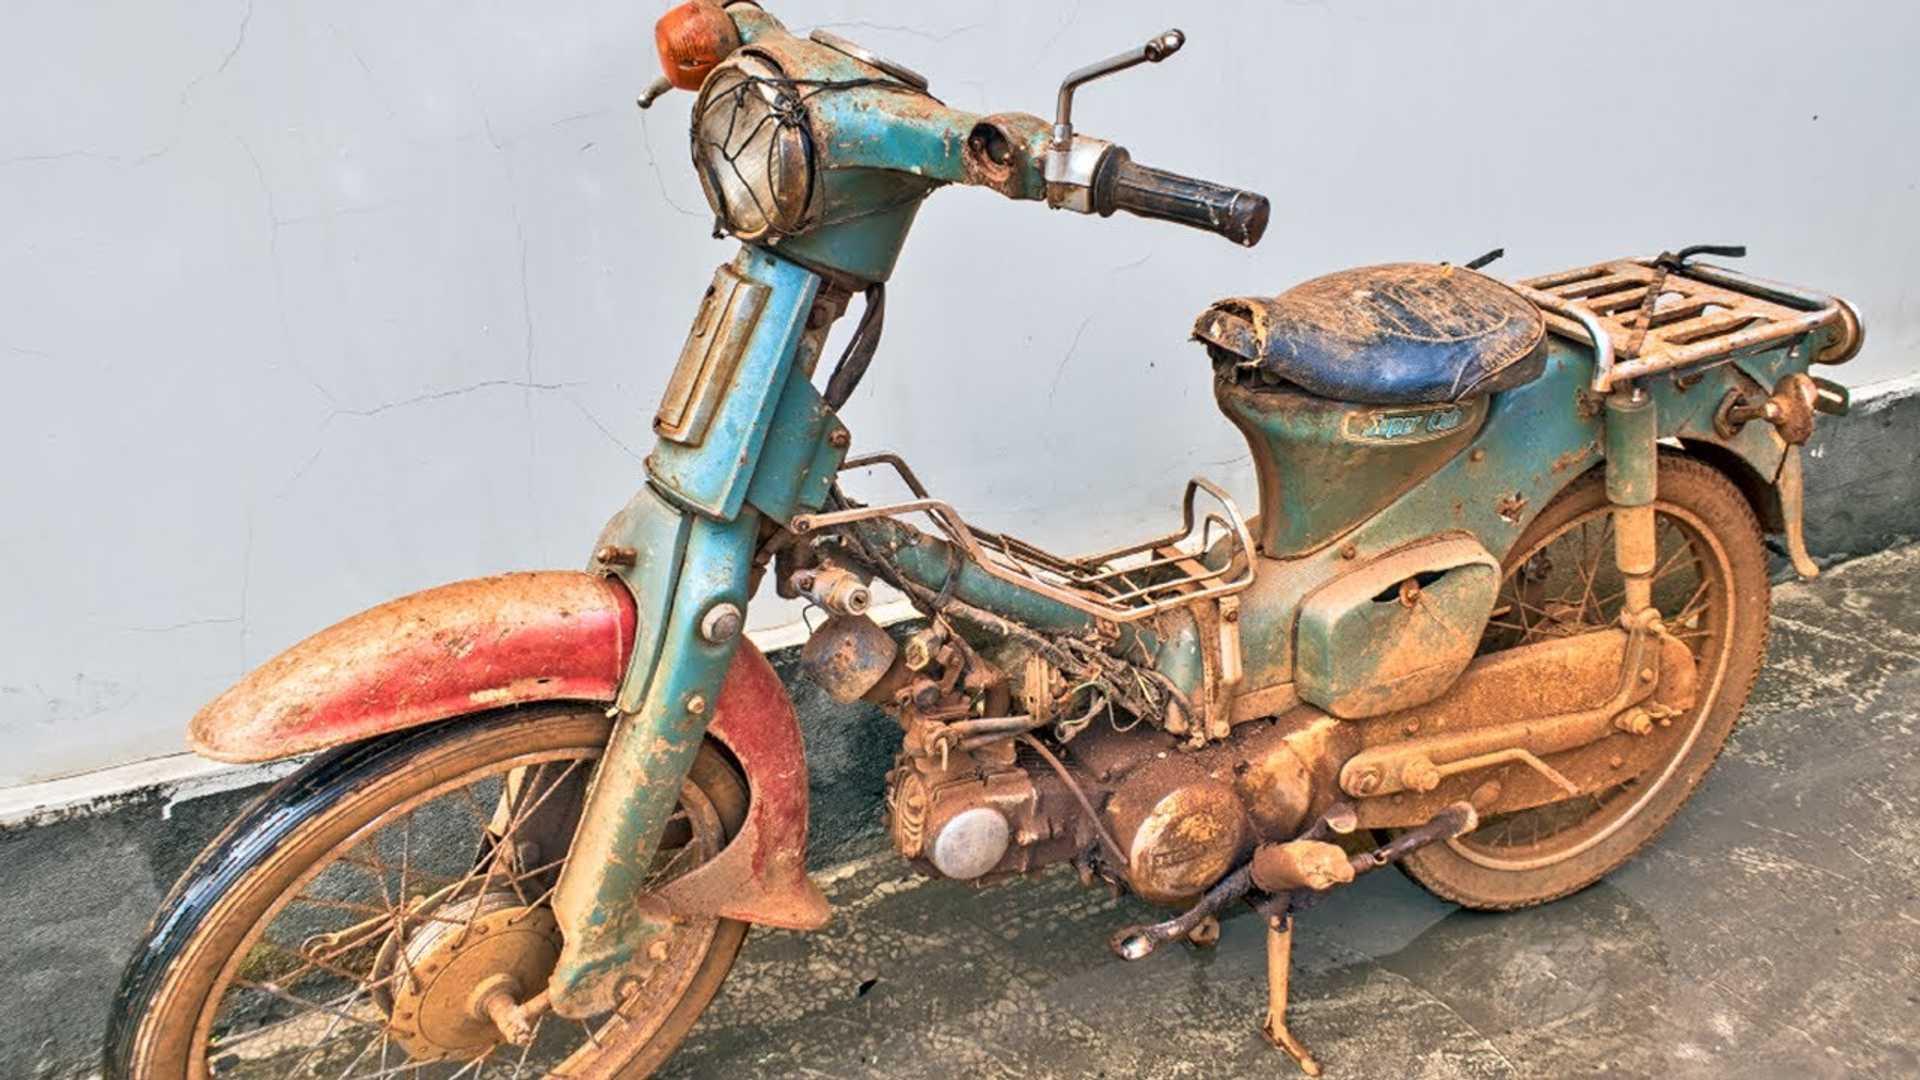 Watch A Honda Super Cub Go From Rust Bucket To Retro Beauty